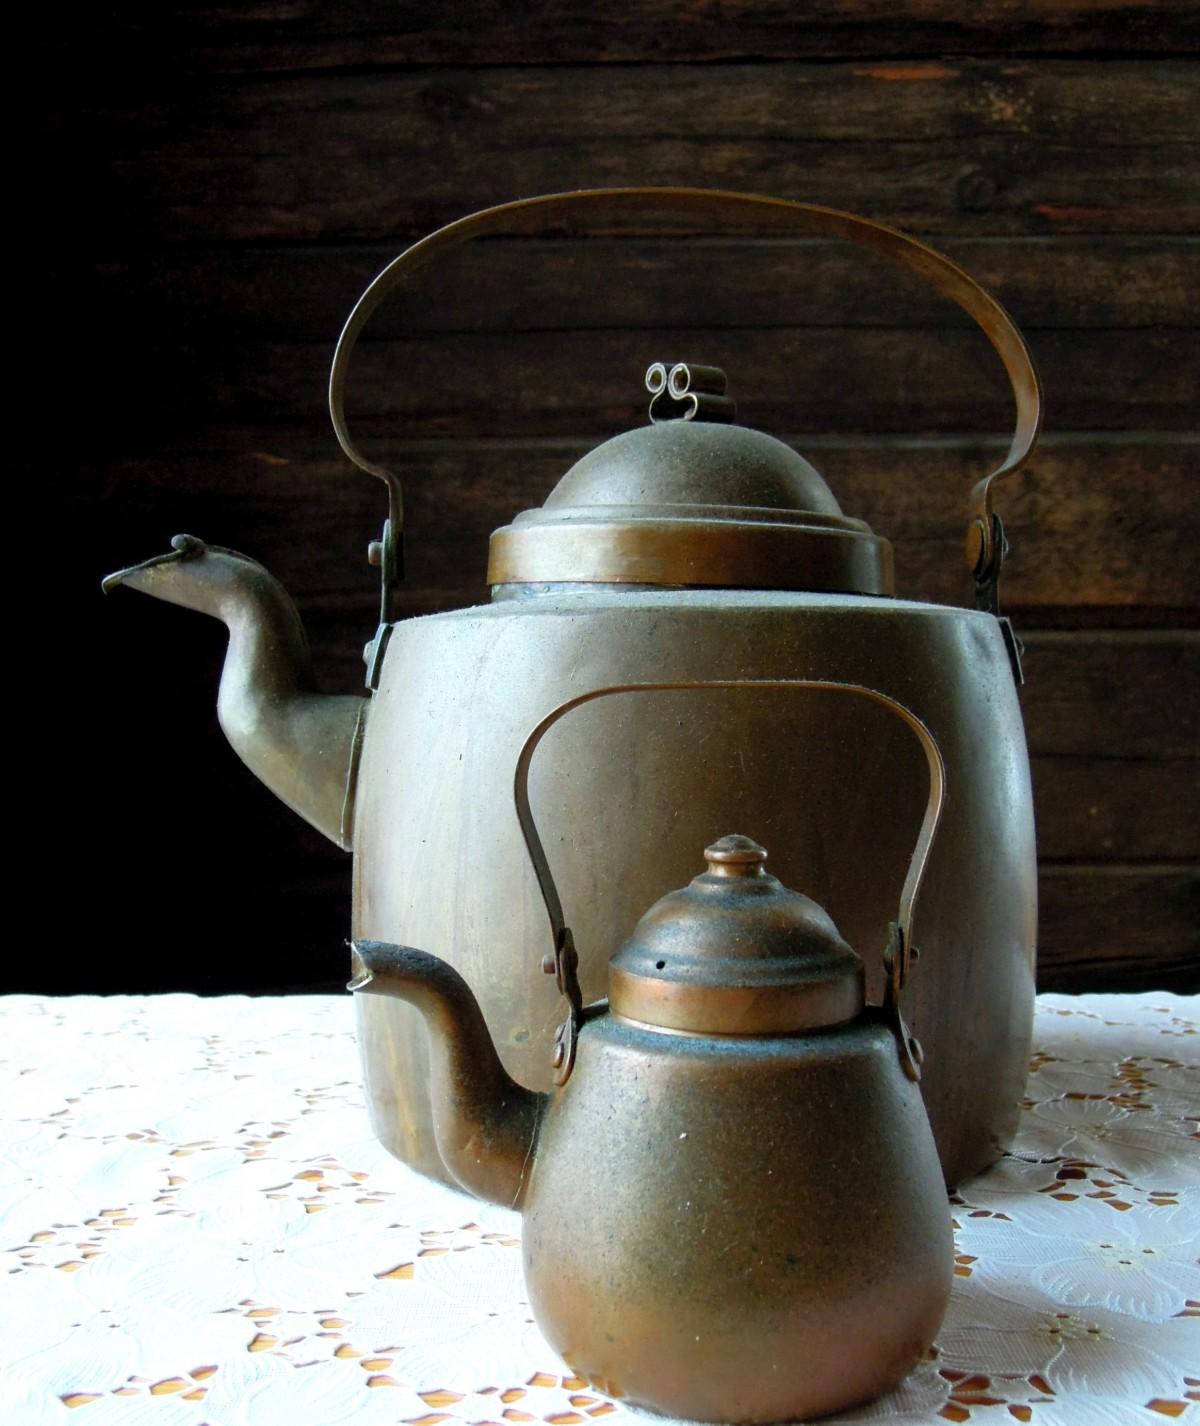 Free Images Coffee Retro Old Teapot Home Ceramic